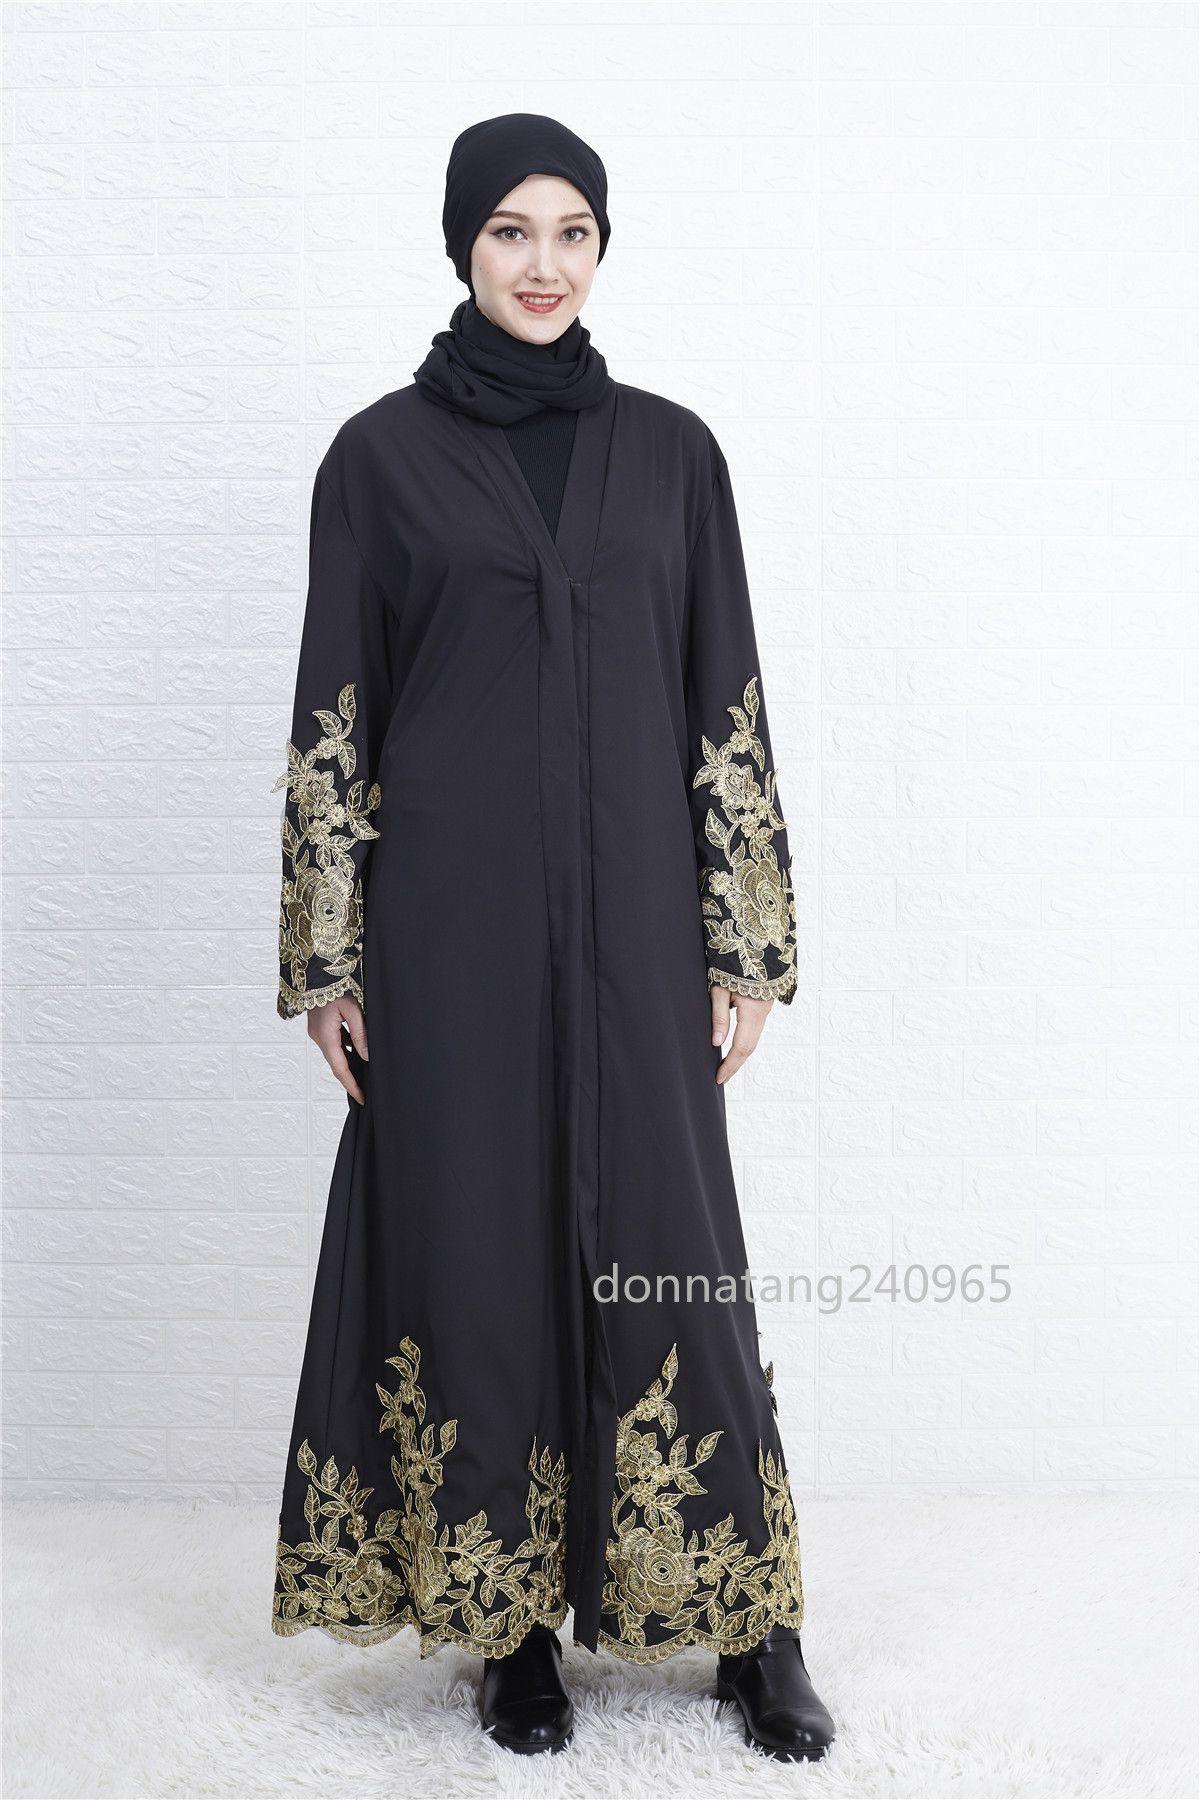 9d9aa6d9fef Women Black Abaya Dubai Islamic Clothing Maxi Muslim Dress Ukraine Long  Caftan Lace Patchwork Bangladesh Kaftan Turkey Robe 2019 Blue Lace Maxi  Dress Women ...